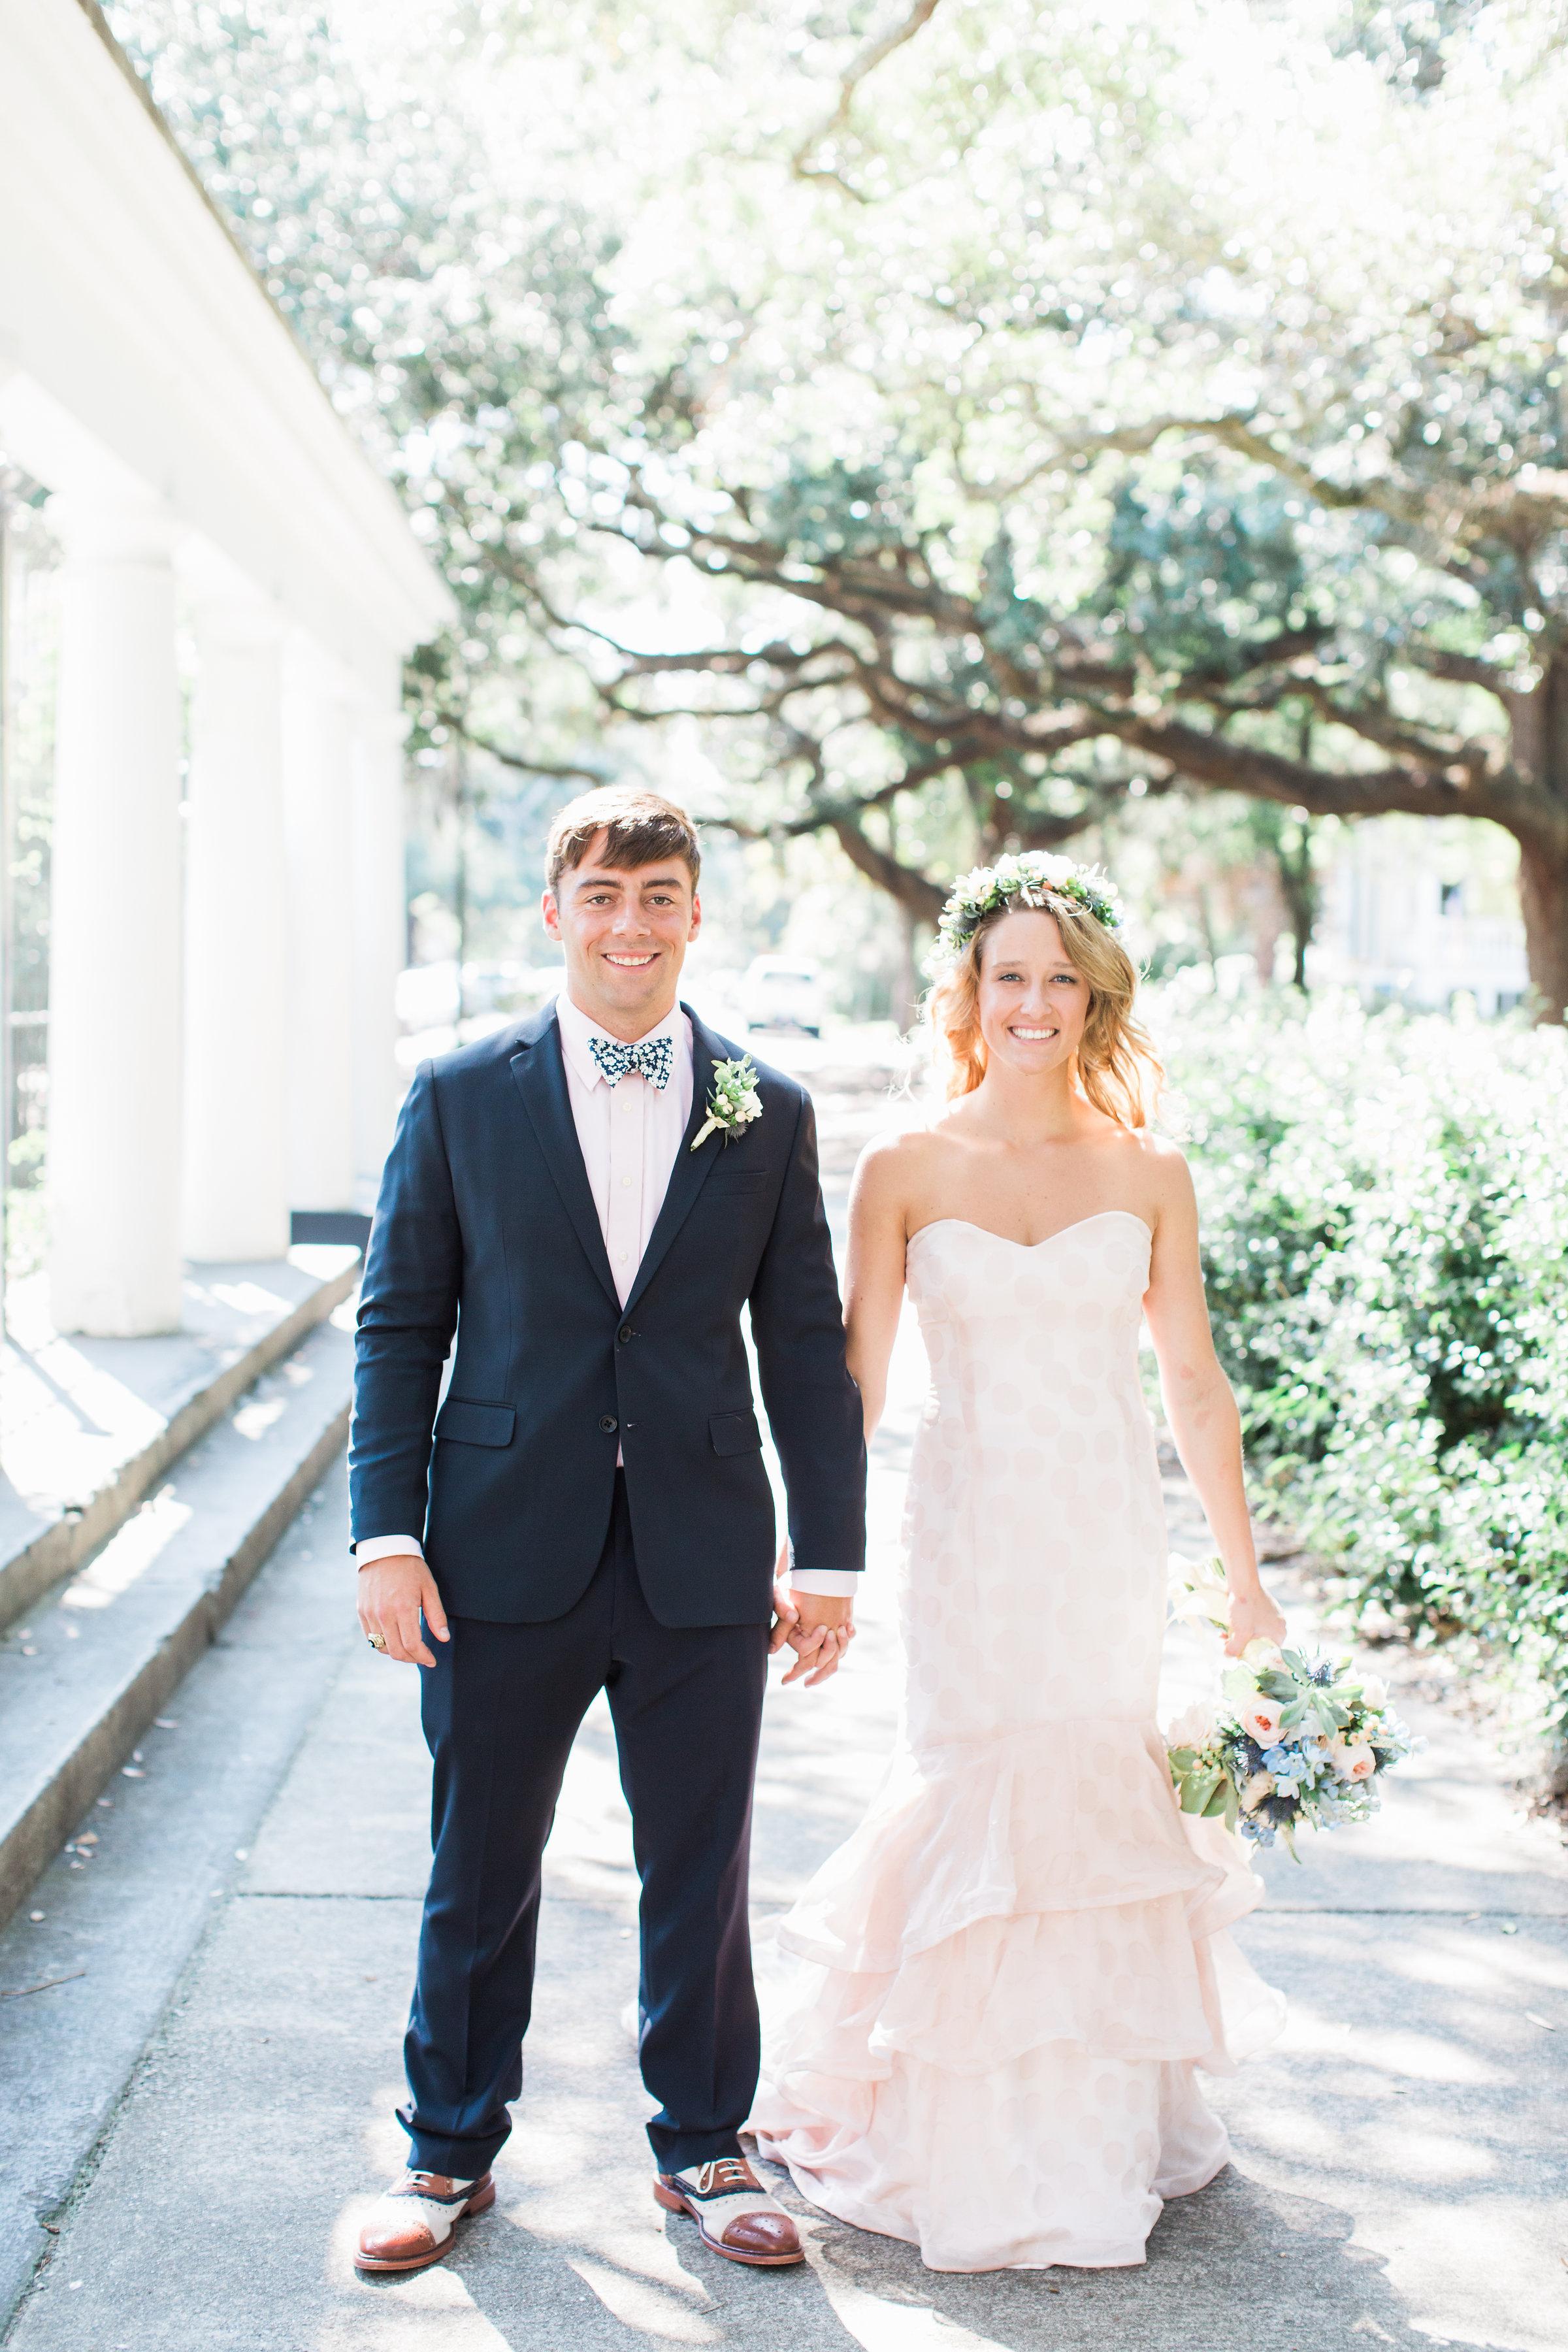 Savannah Bride & Groom's wedding portraits in Forsyth Park  //  A Lowcountry Wedding Magazine